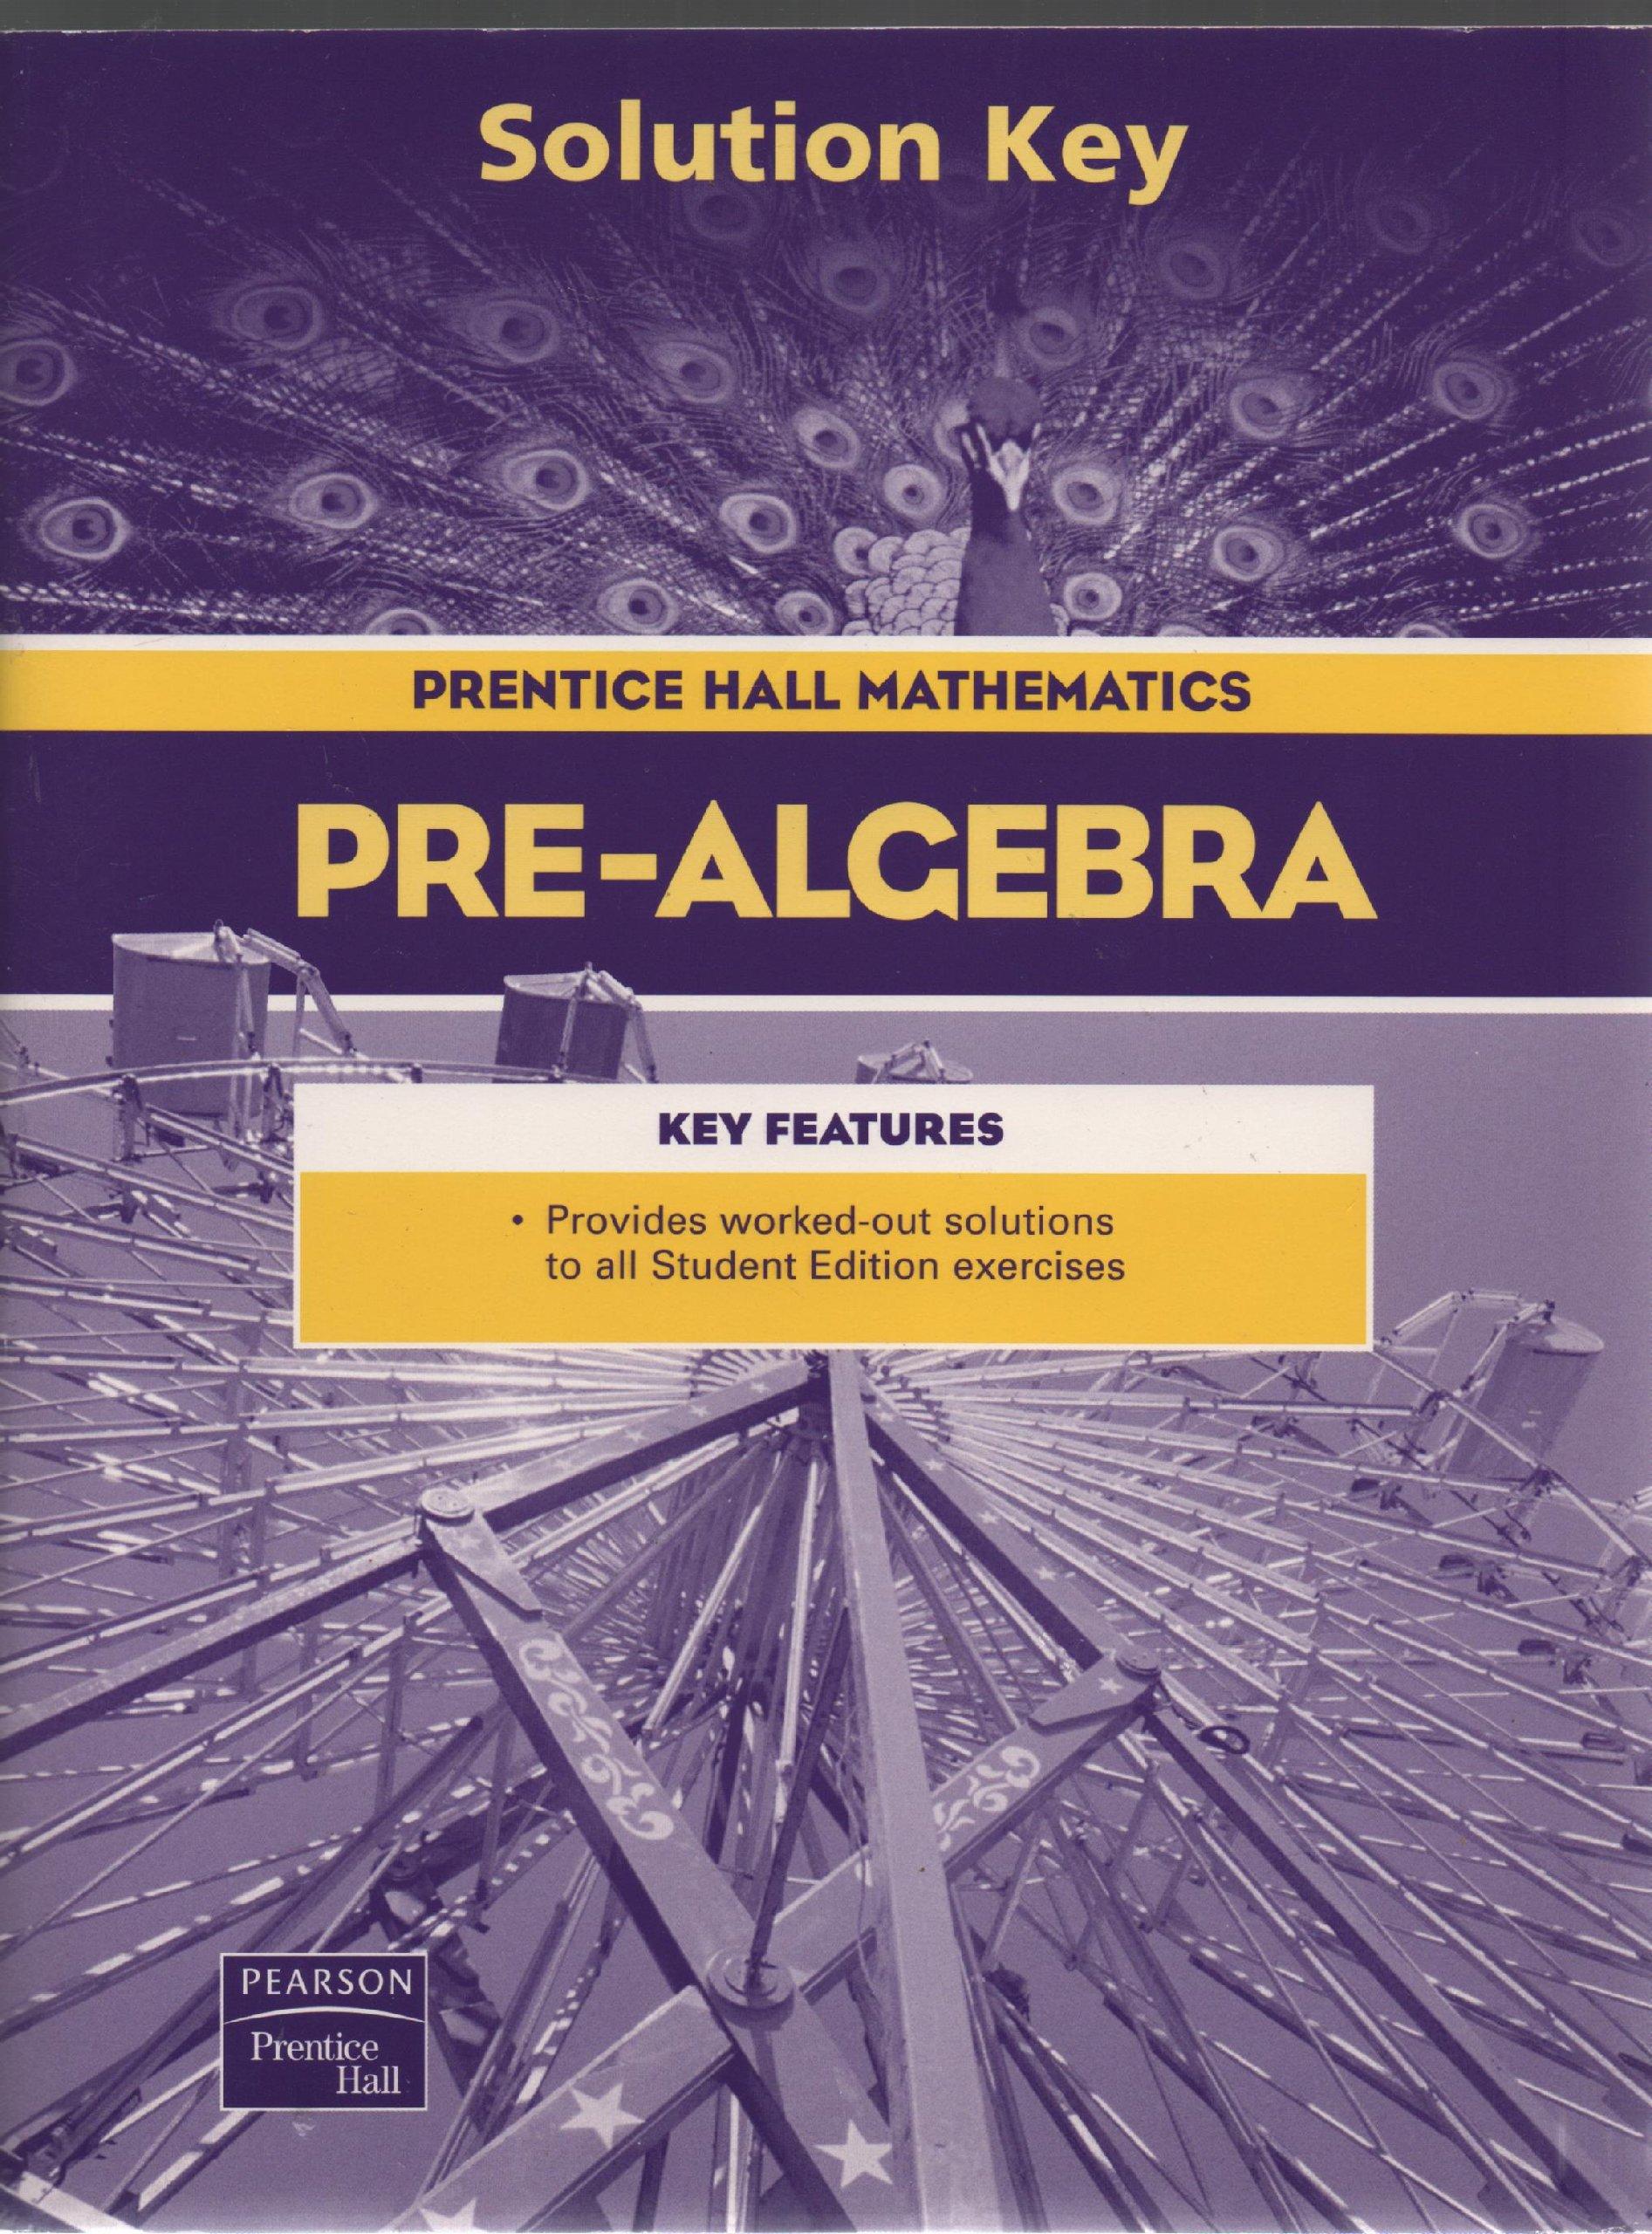 Prentice Hall PreAlgebra Solution Key Pearson Prentice Hall – Pearson Prentice Hall Math Worksheet Answers